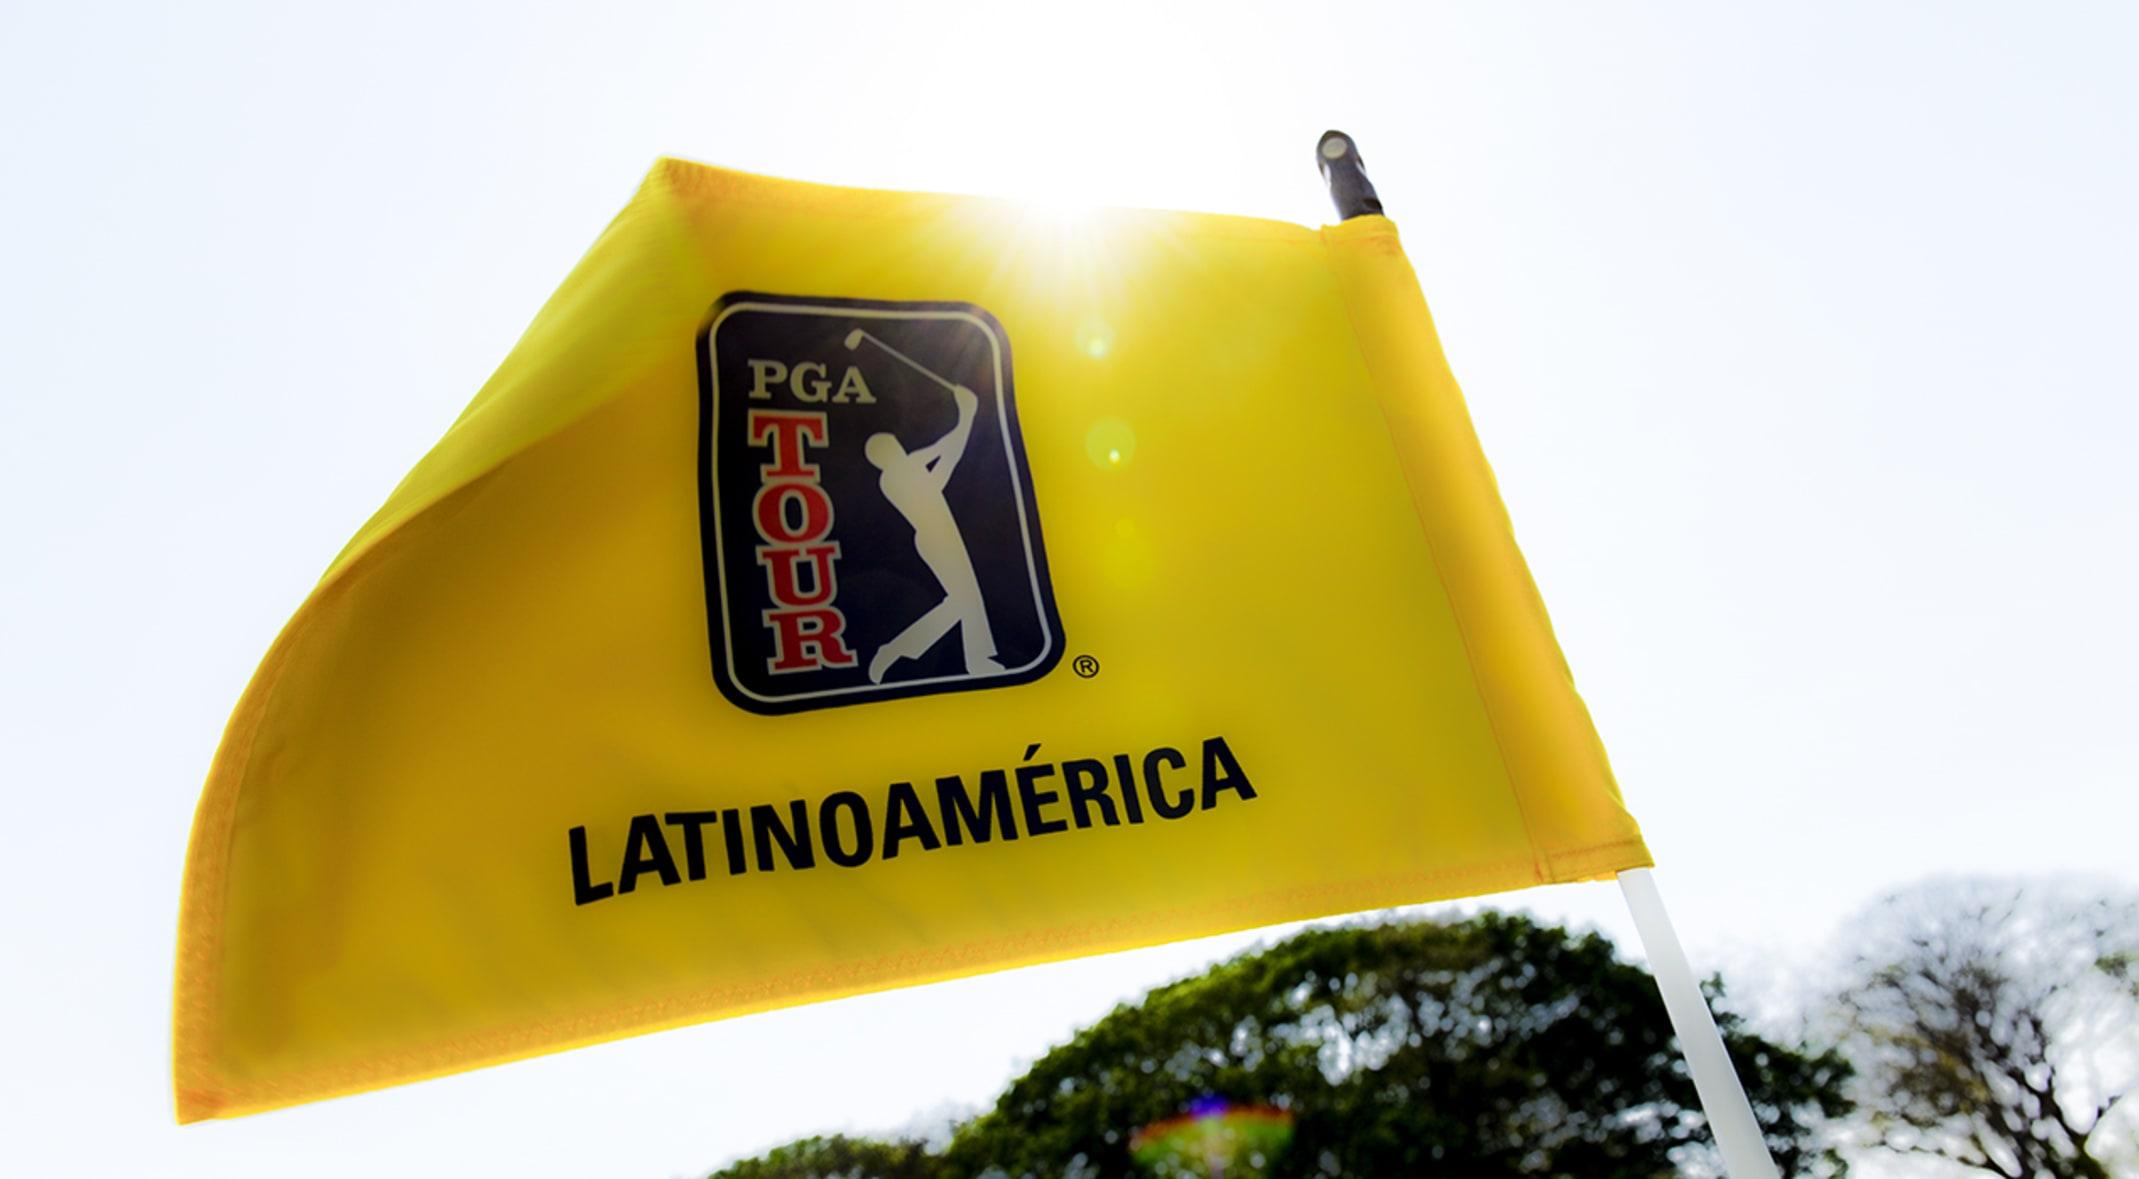 pga tour latinoamérica announces second half of the 2016 calendar